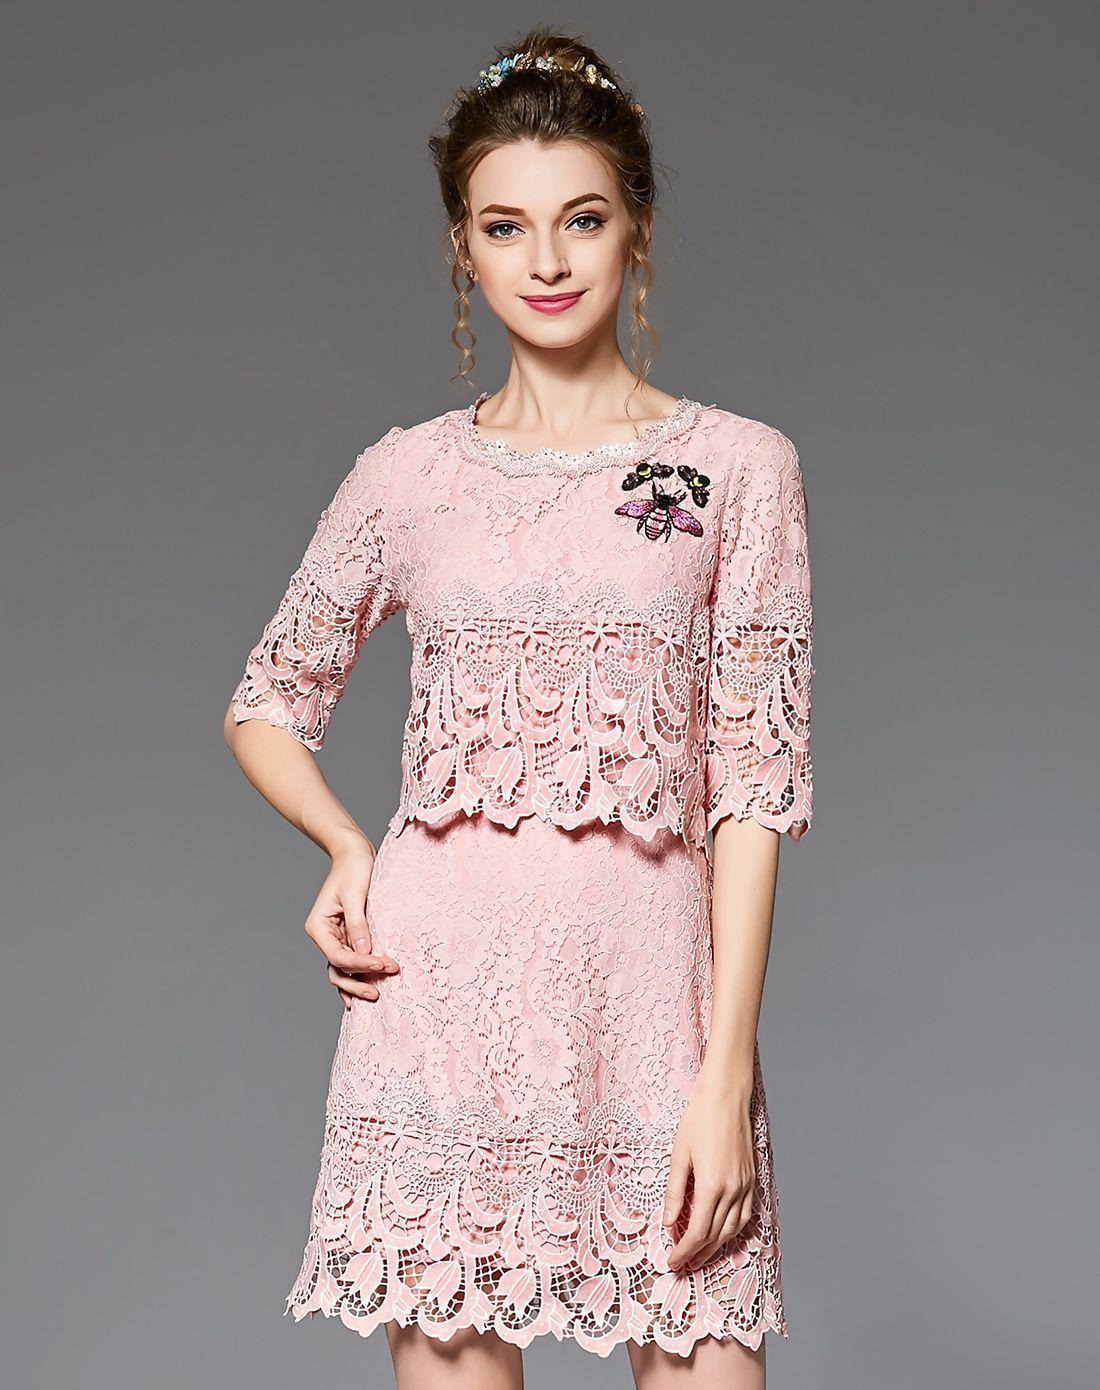 Adorewe vipme sheath dressesdesigner ouyalin pink cutout lace